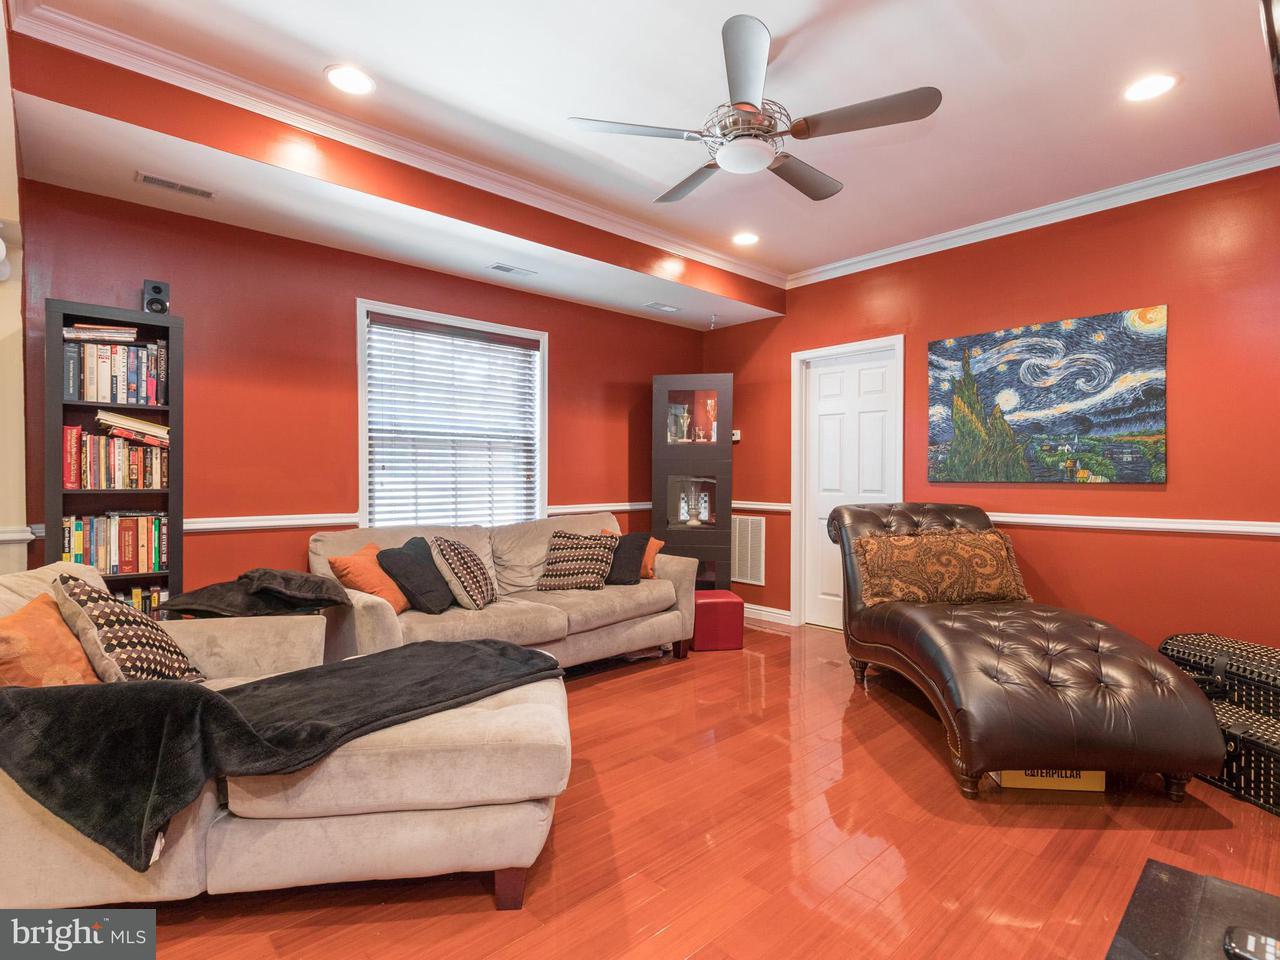 Condominium for Sale at 5045 C St SE #202 Washington, District Of Columbia 20019 United States